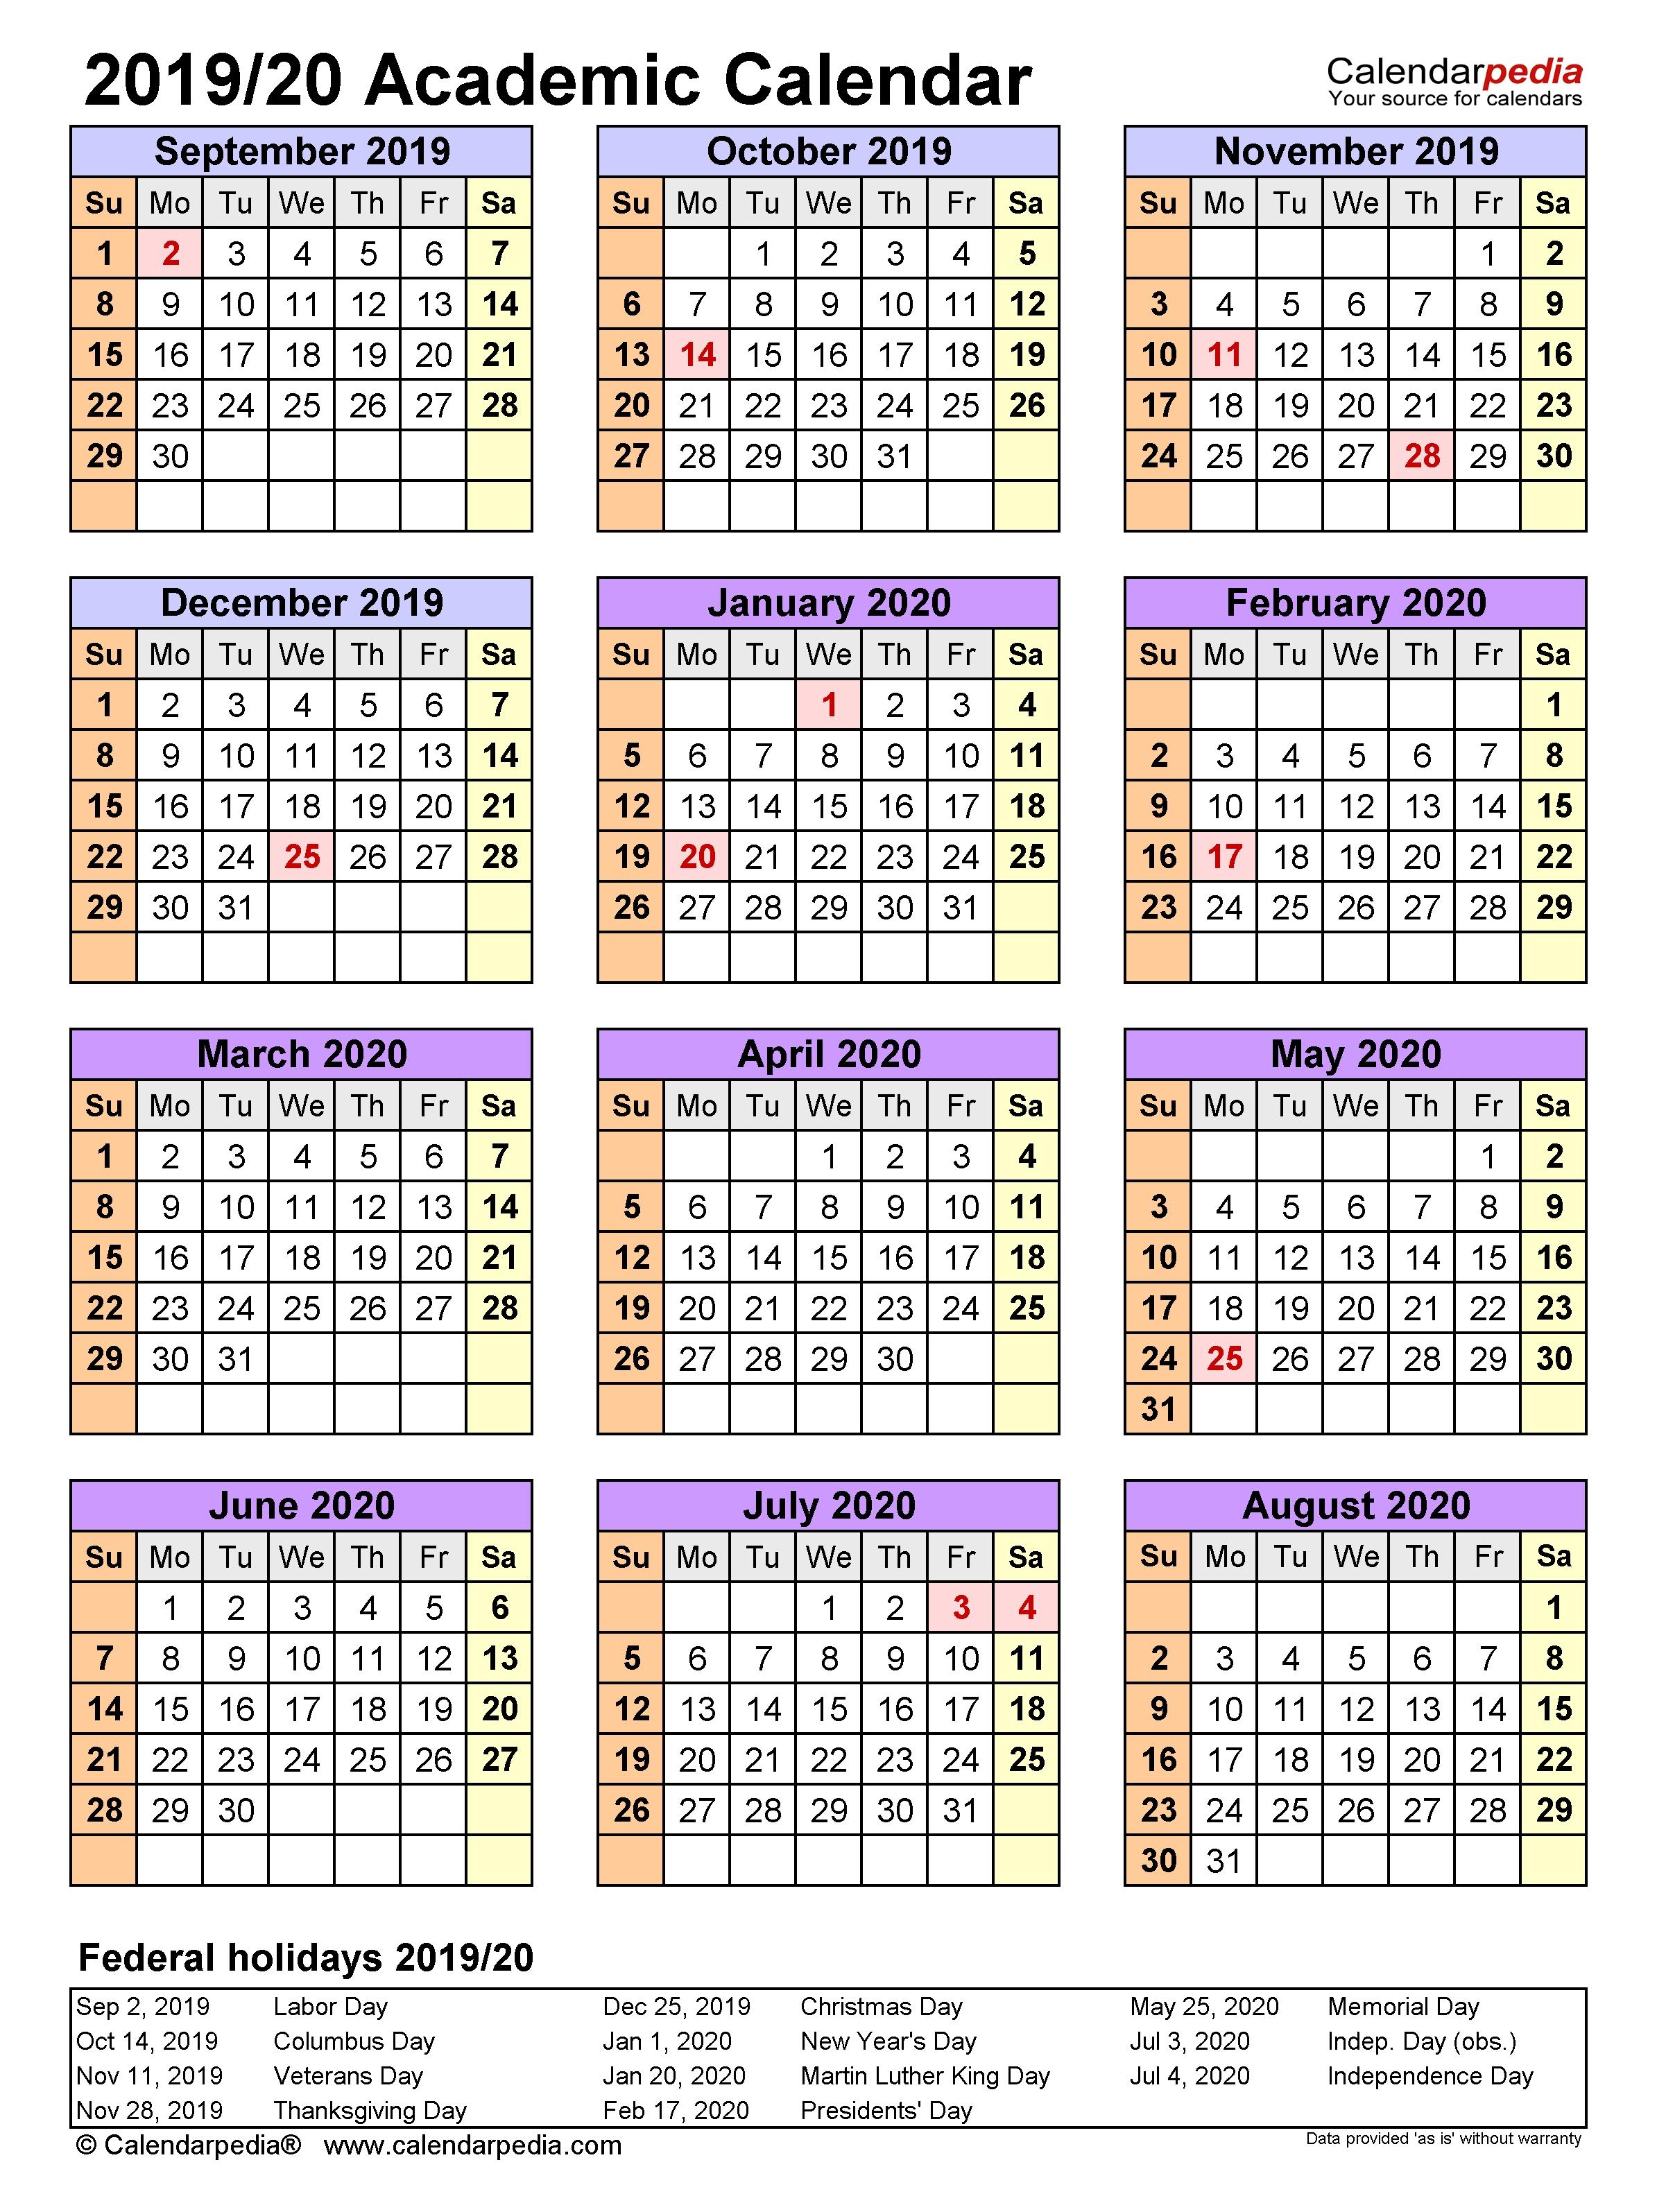 Academic Calendars 2019/2020 - Free Printable Word Templates with regard to U Of T 2020-2021 Academic Calendar